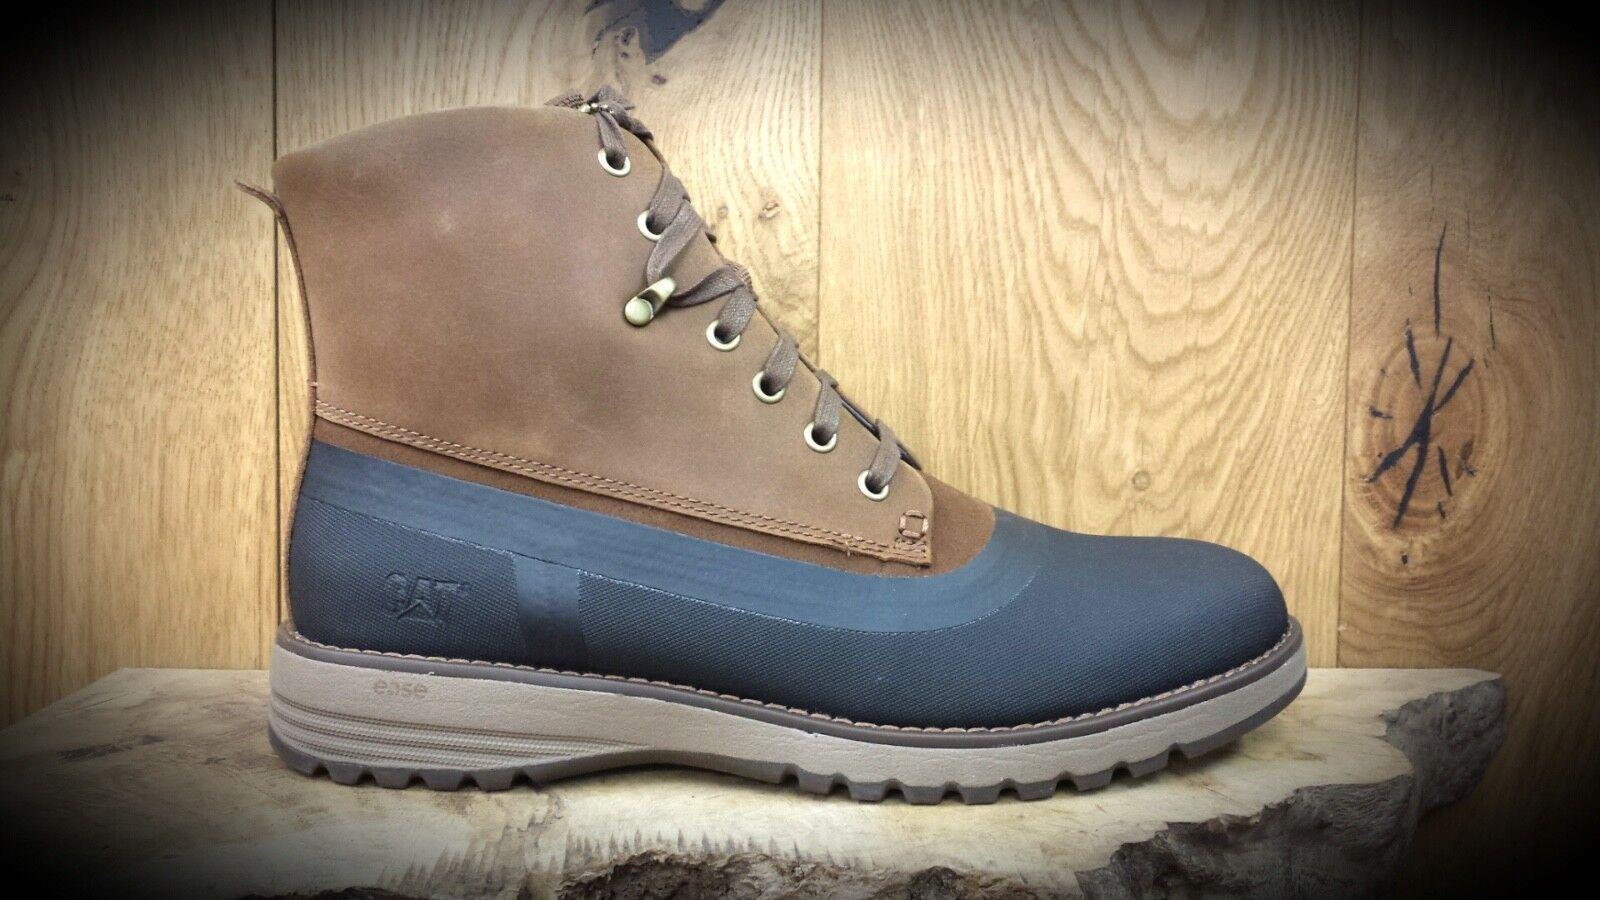 CAT // Caterpillar Caterpillar Caterpillar // Radley // Mens Waterproof Winter Boots // NEW 348a2e